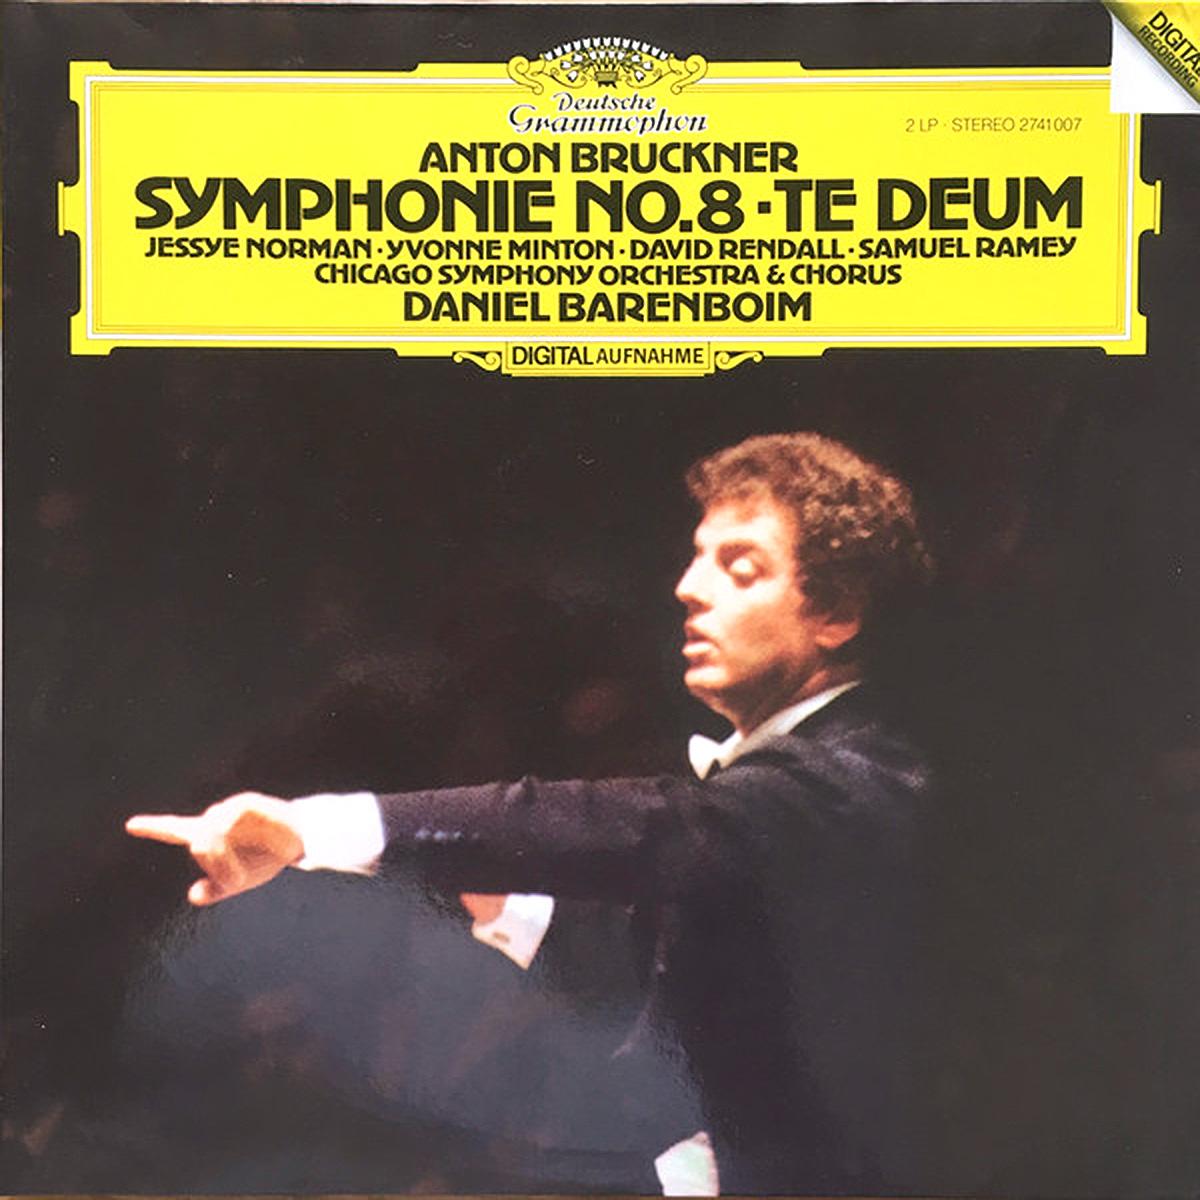 DGG 2741008 Bruckner Symphonie 8 Barenboim